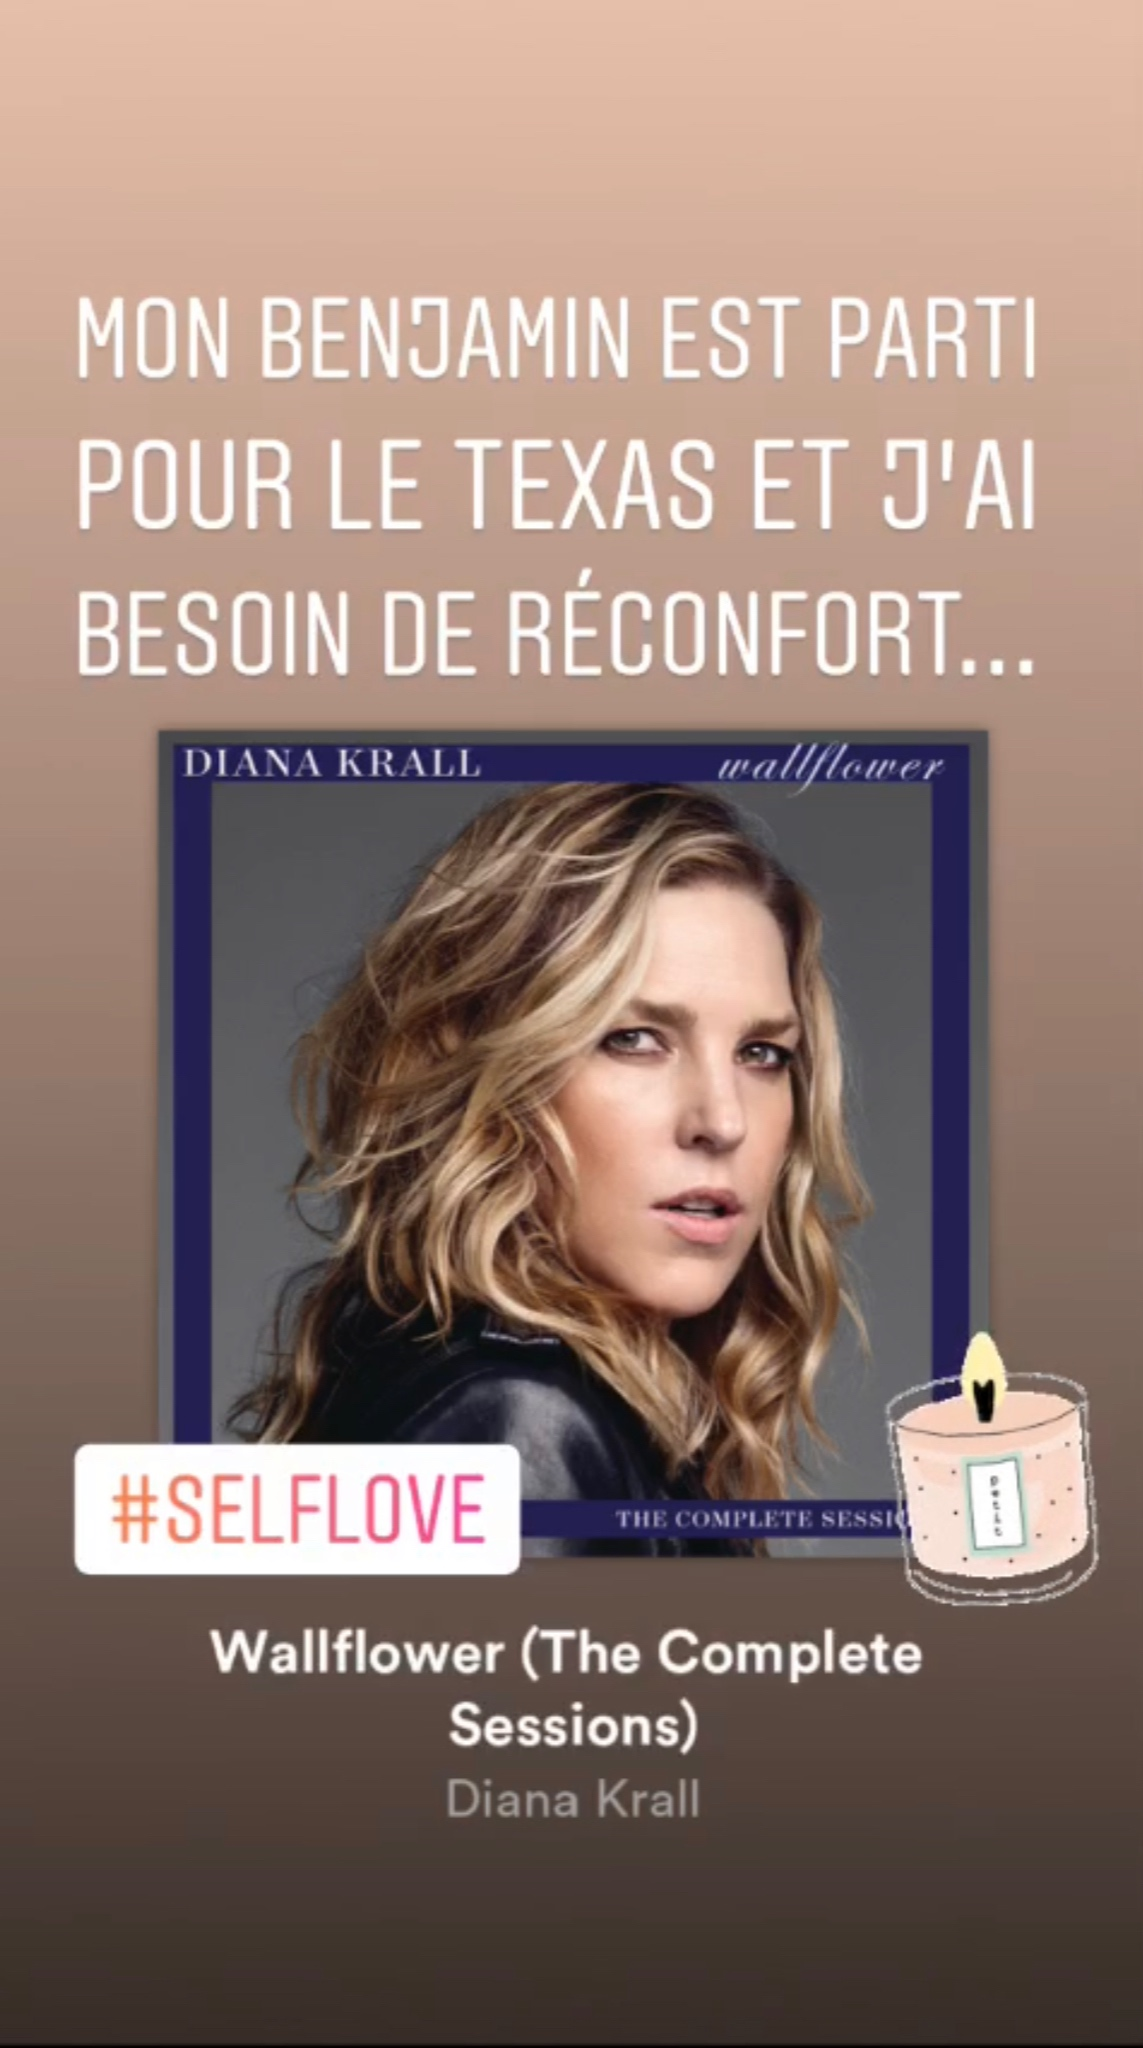 Instagram story Julie au Paradis